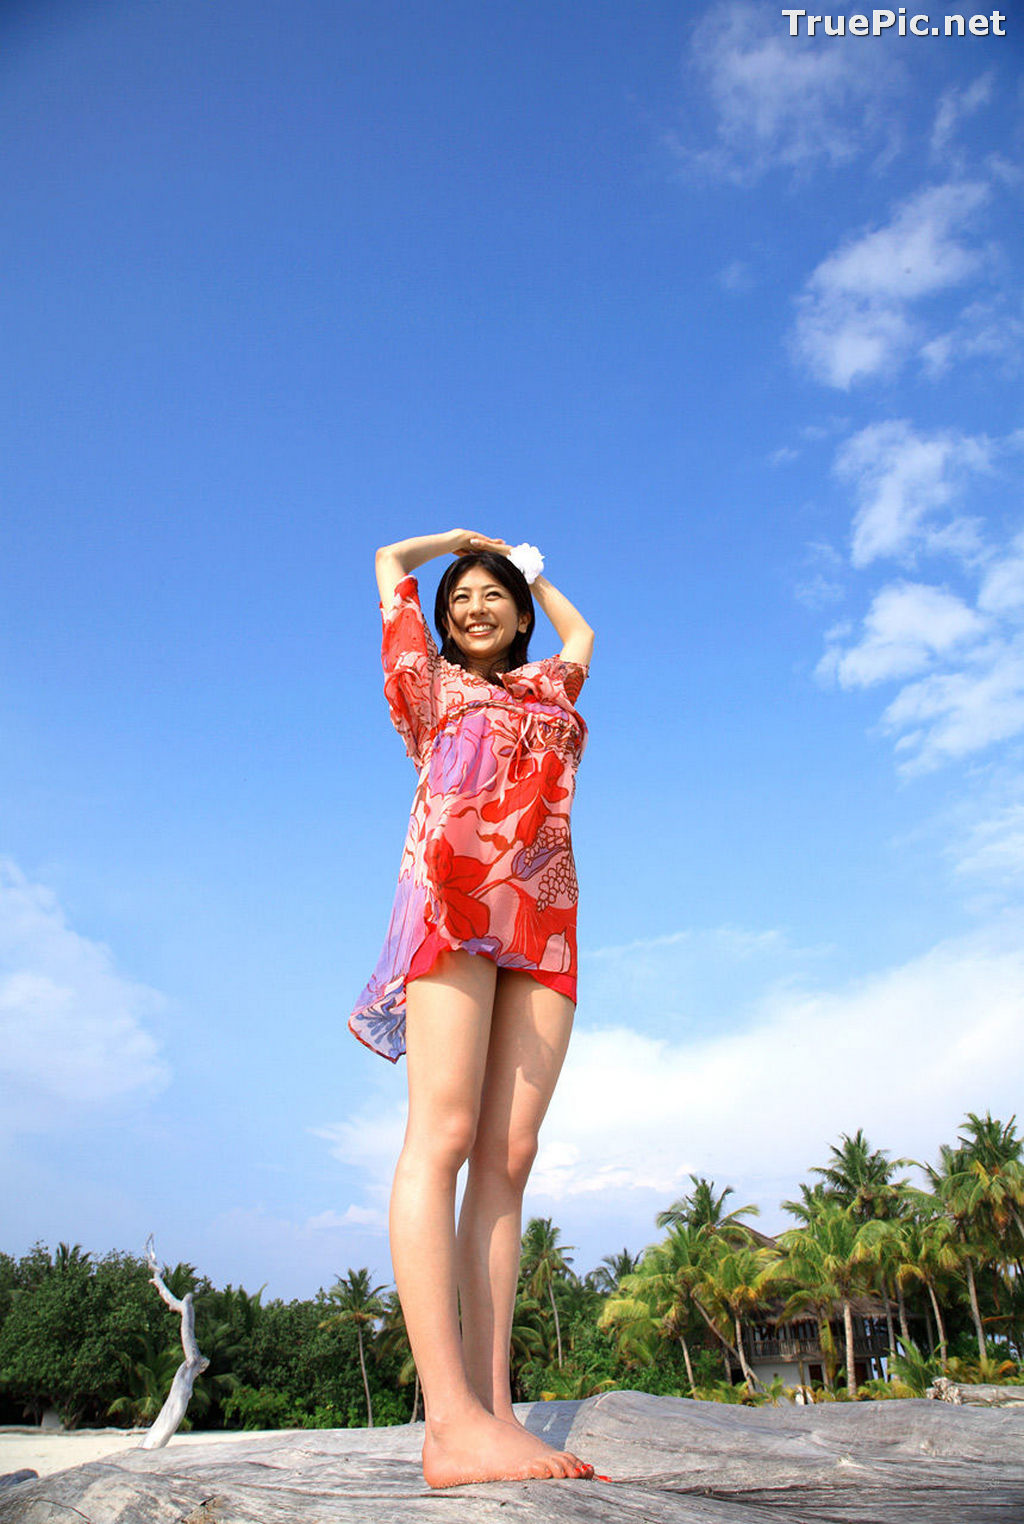 Image Japanese Actress - Miho Shiraishi - Heavens Door Photo Album - TruePic.net - Picture-4